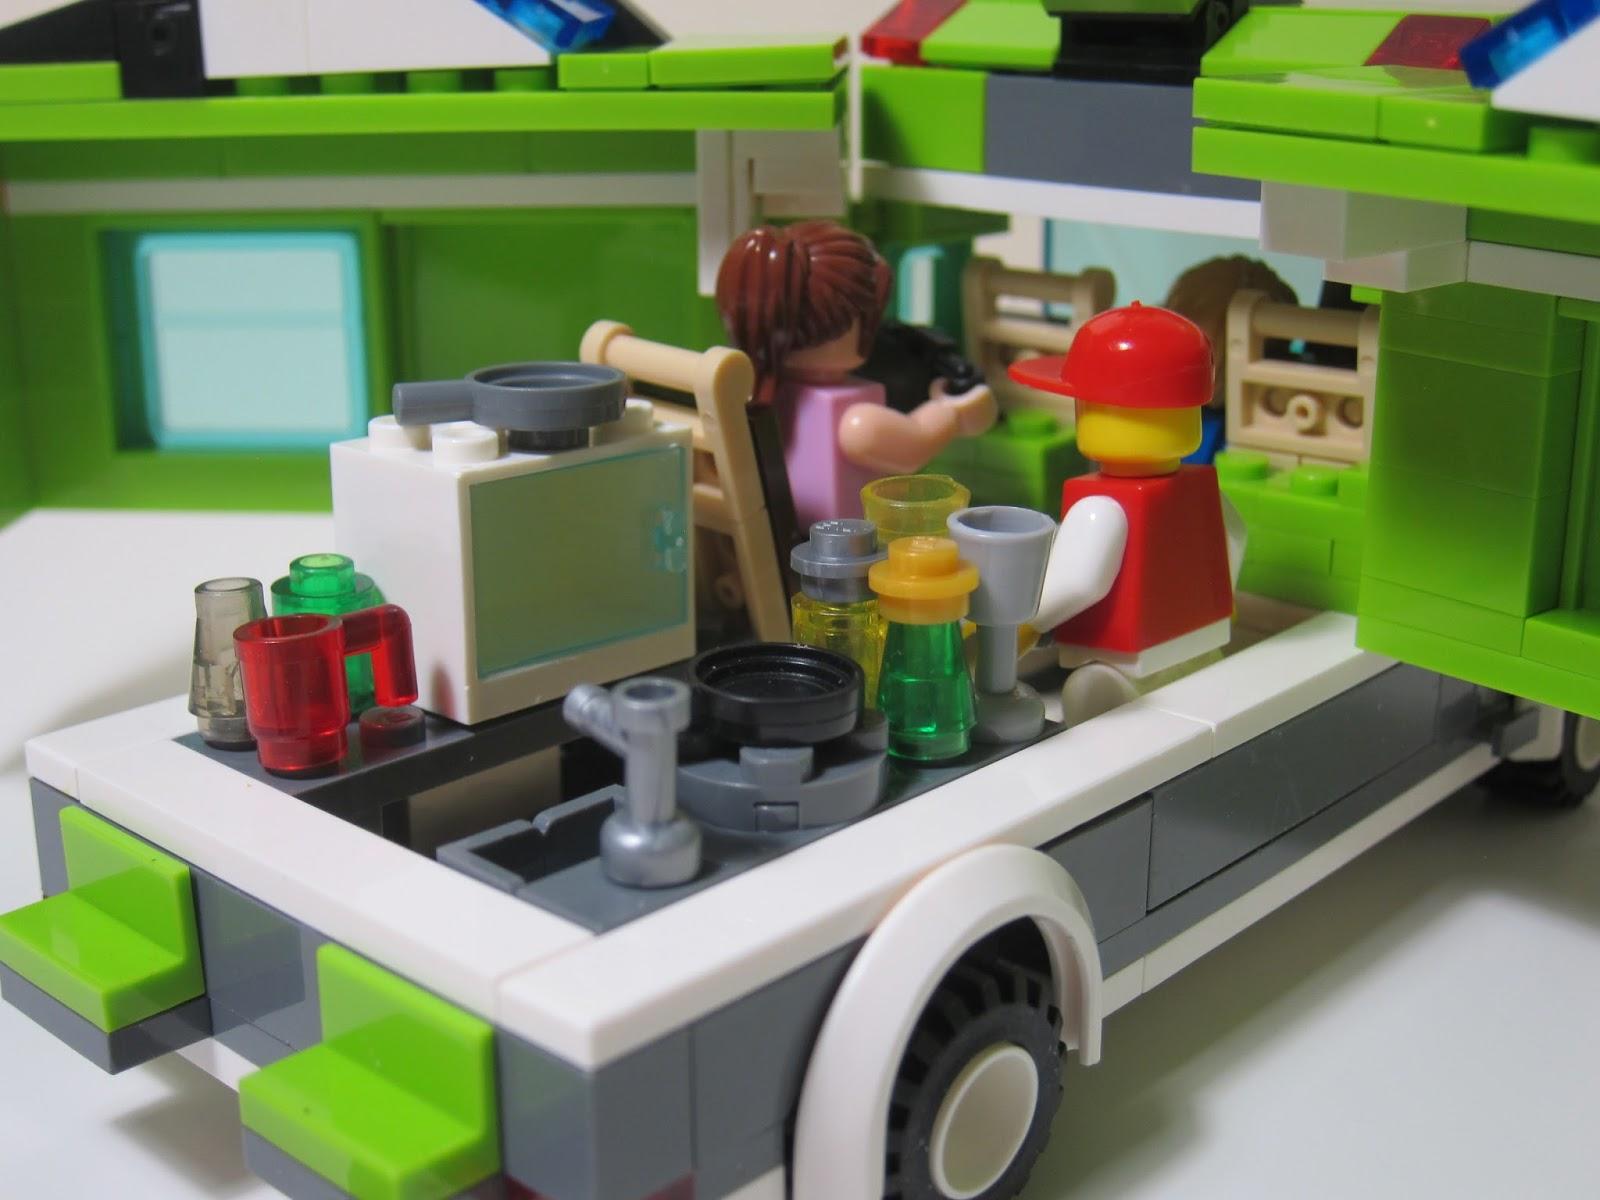 Its Not Lego Enlighten 1120 Pleasant Trip Camper Building Set Review